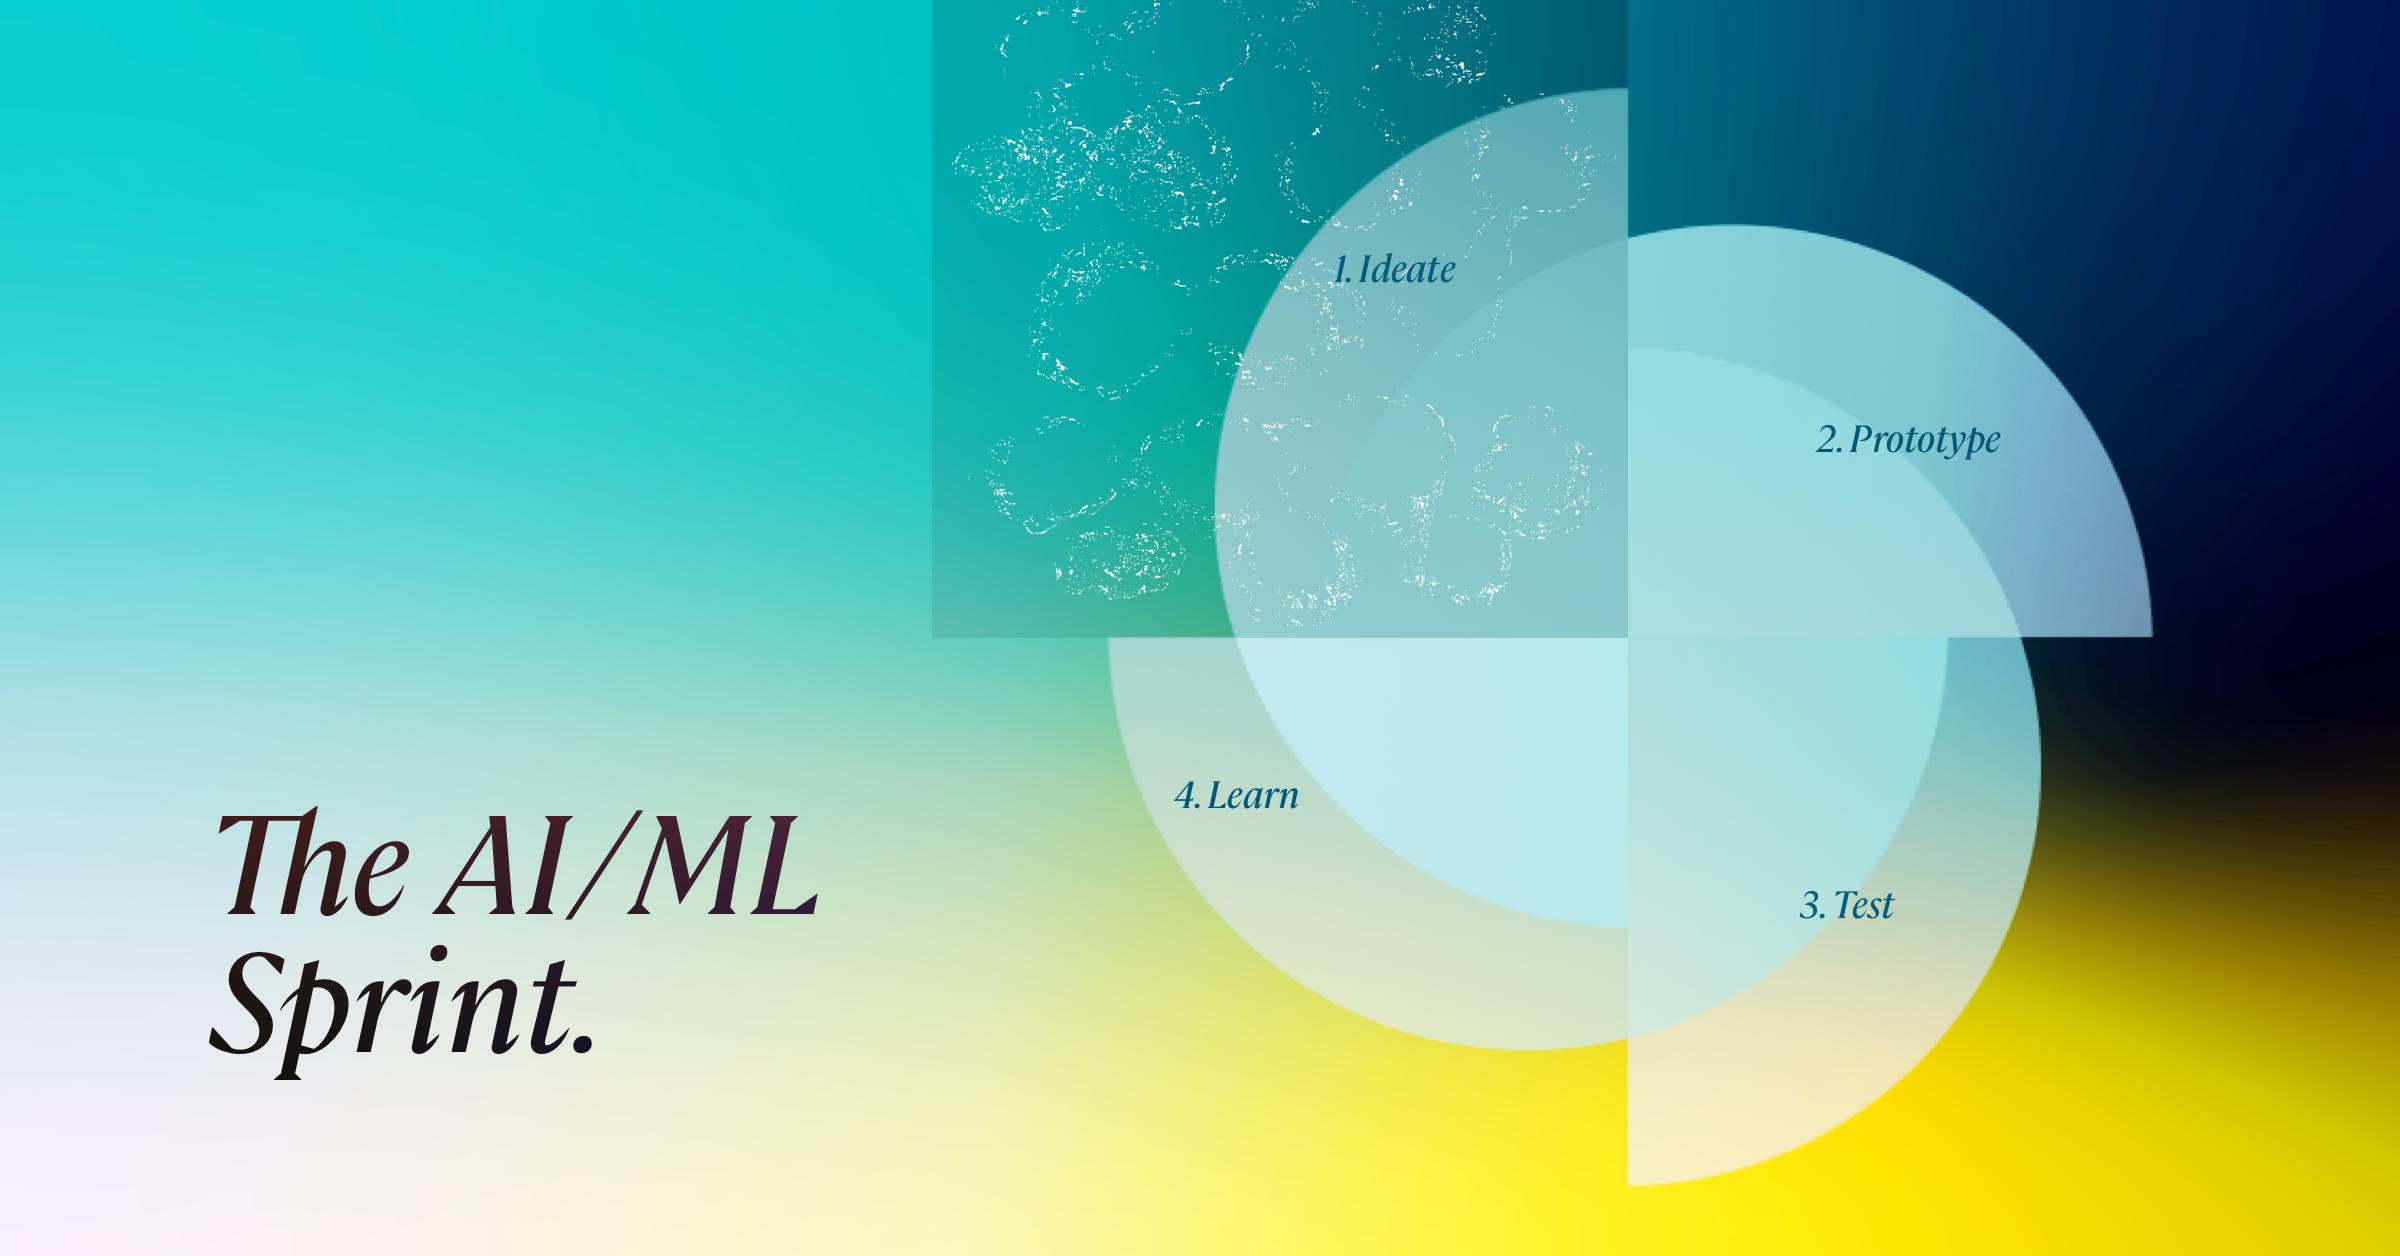 Illustration for AI-ML Sprint blog